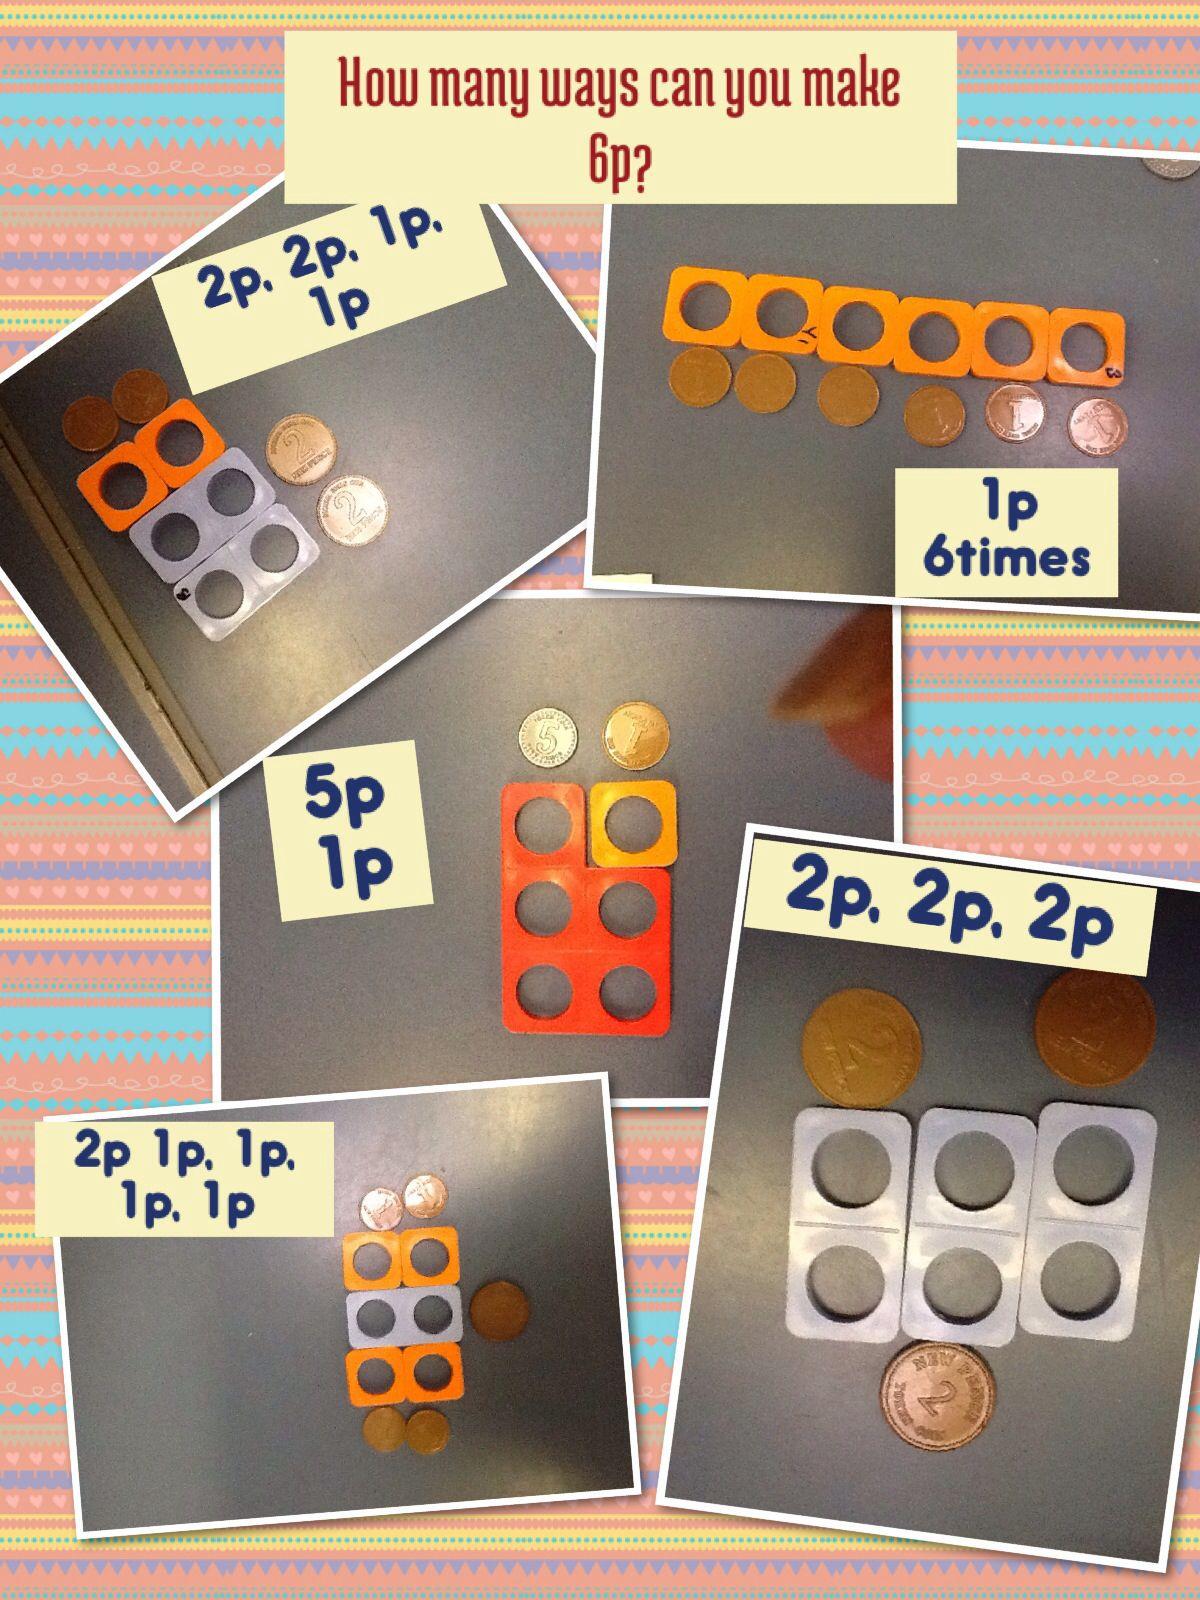 money problem solving making 6p finding different ways homeschool maths eyfs math numicon. Black Bedroom Furniture Sets. Home Design Ideas